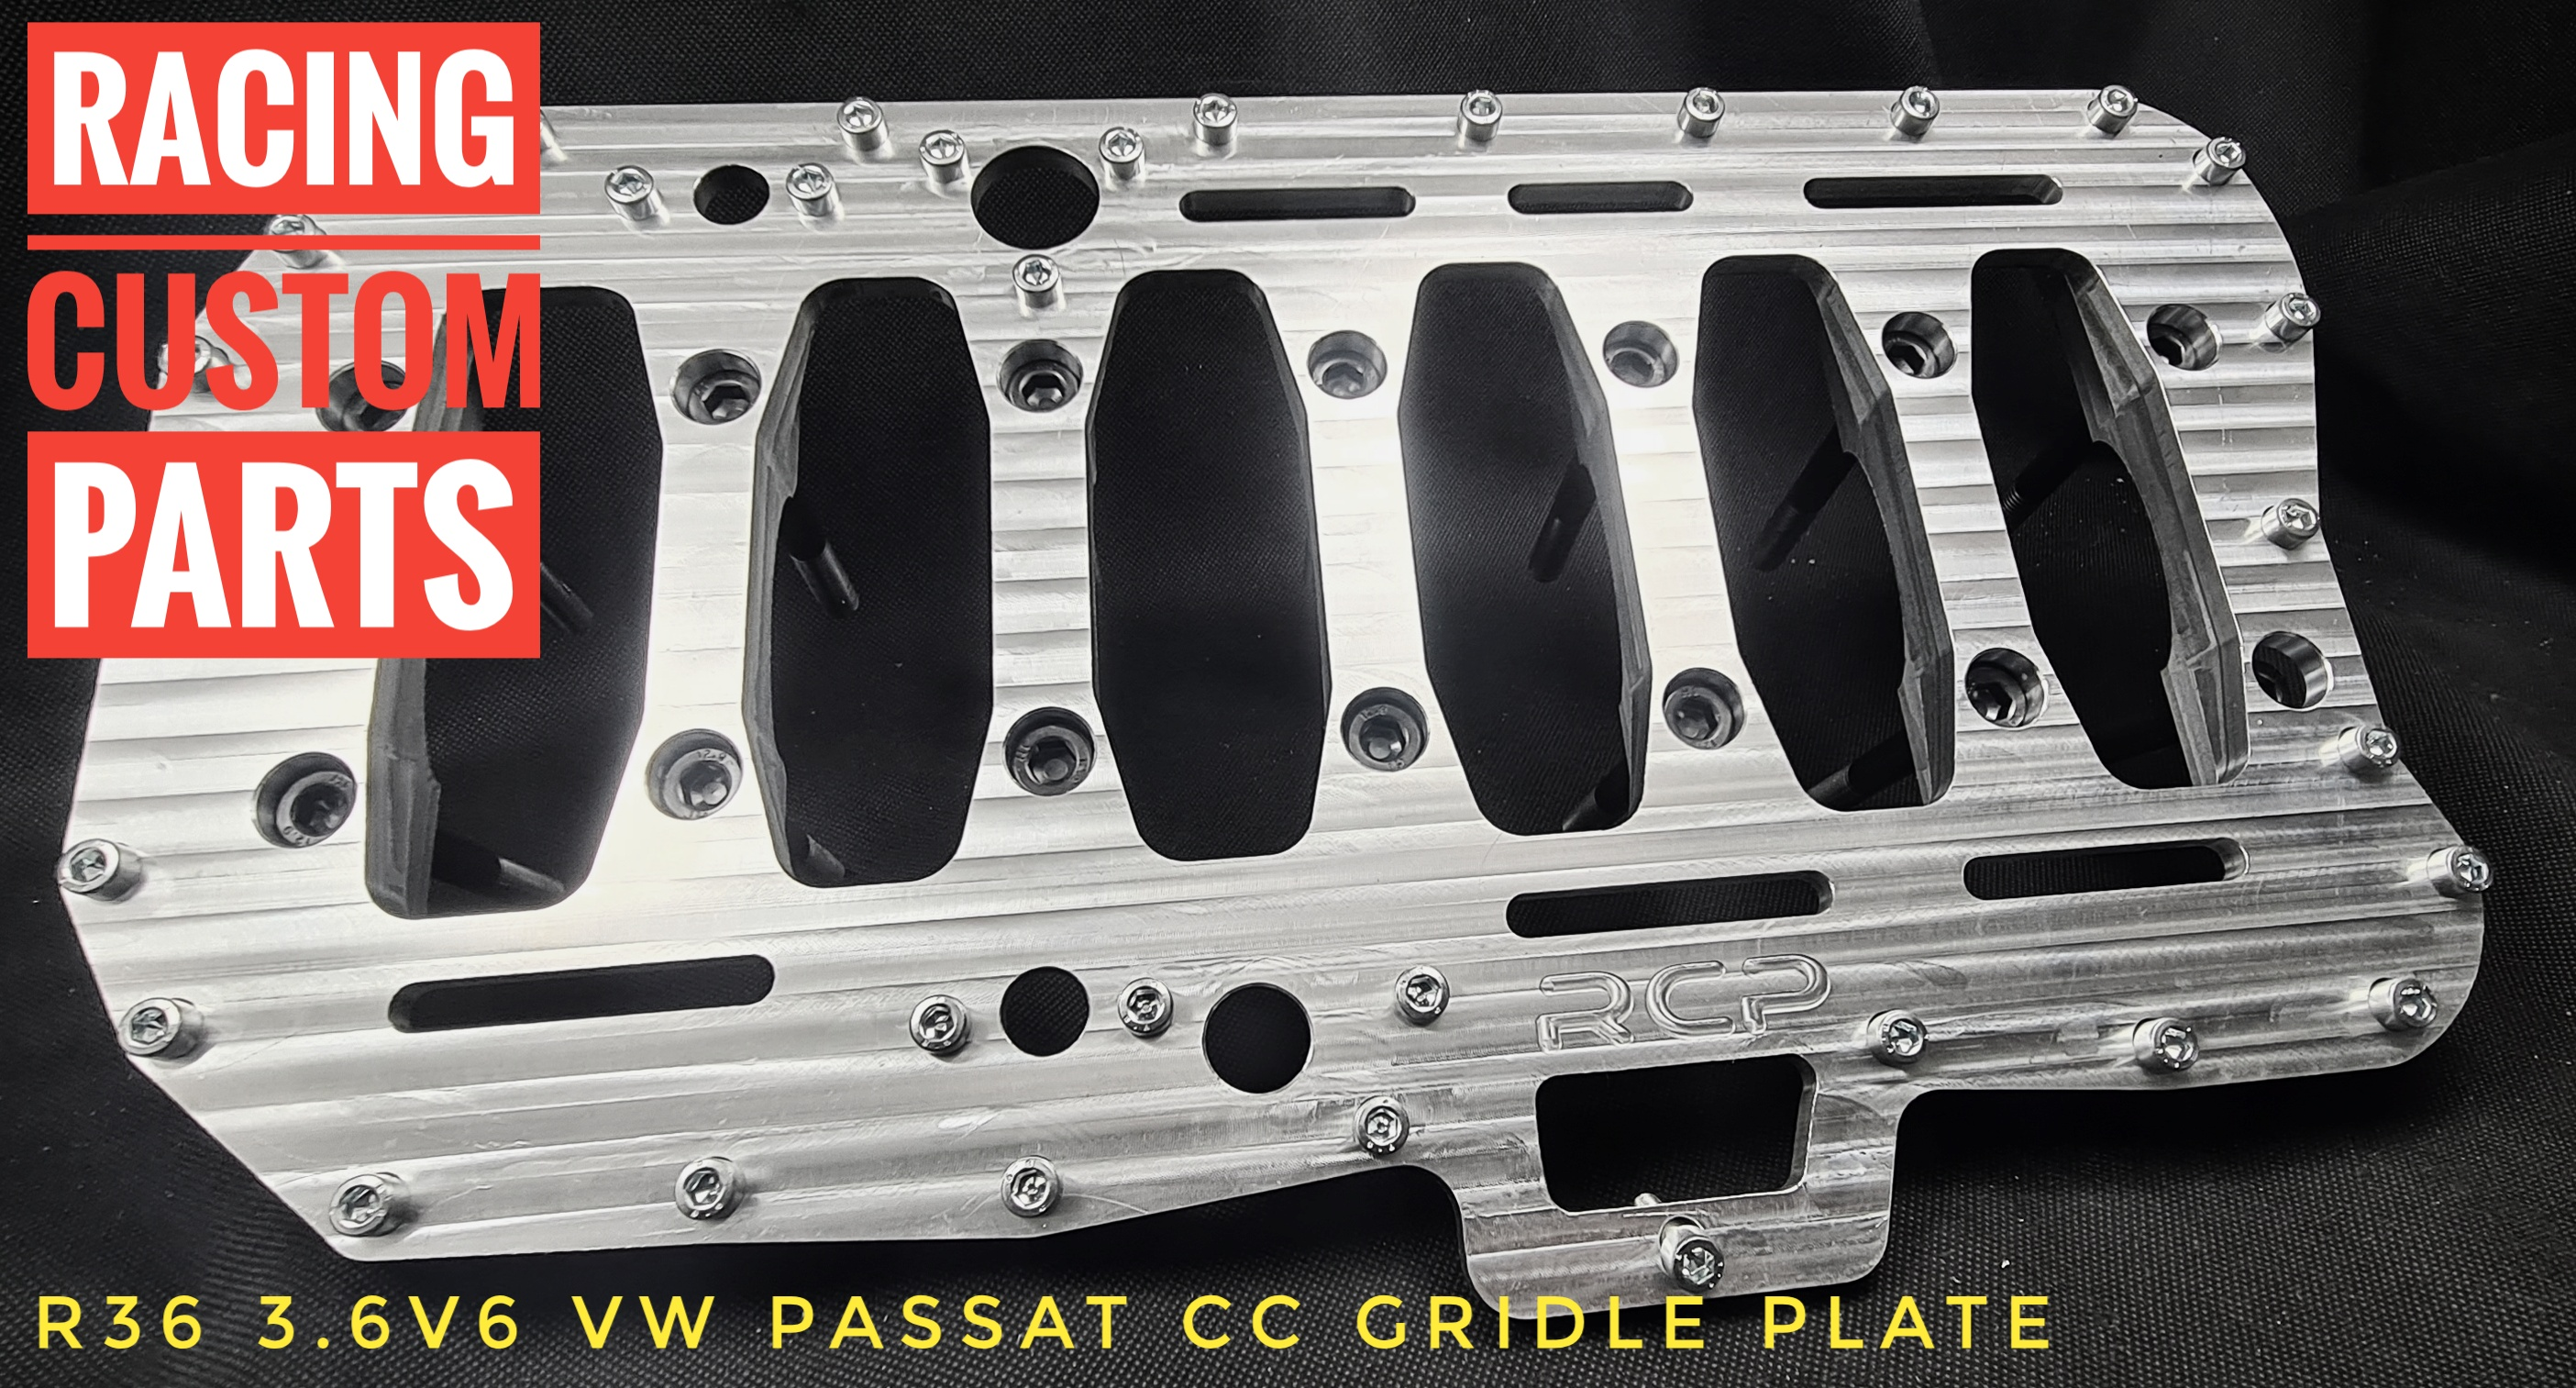 r36 3,6v6 passat cc audi wv girdle plate racing custom parts billet cnc turbo